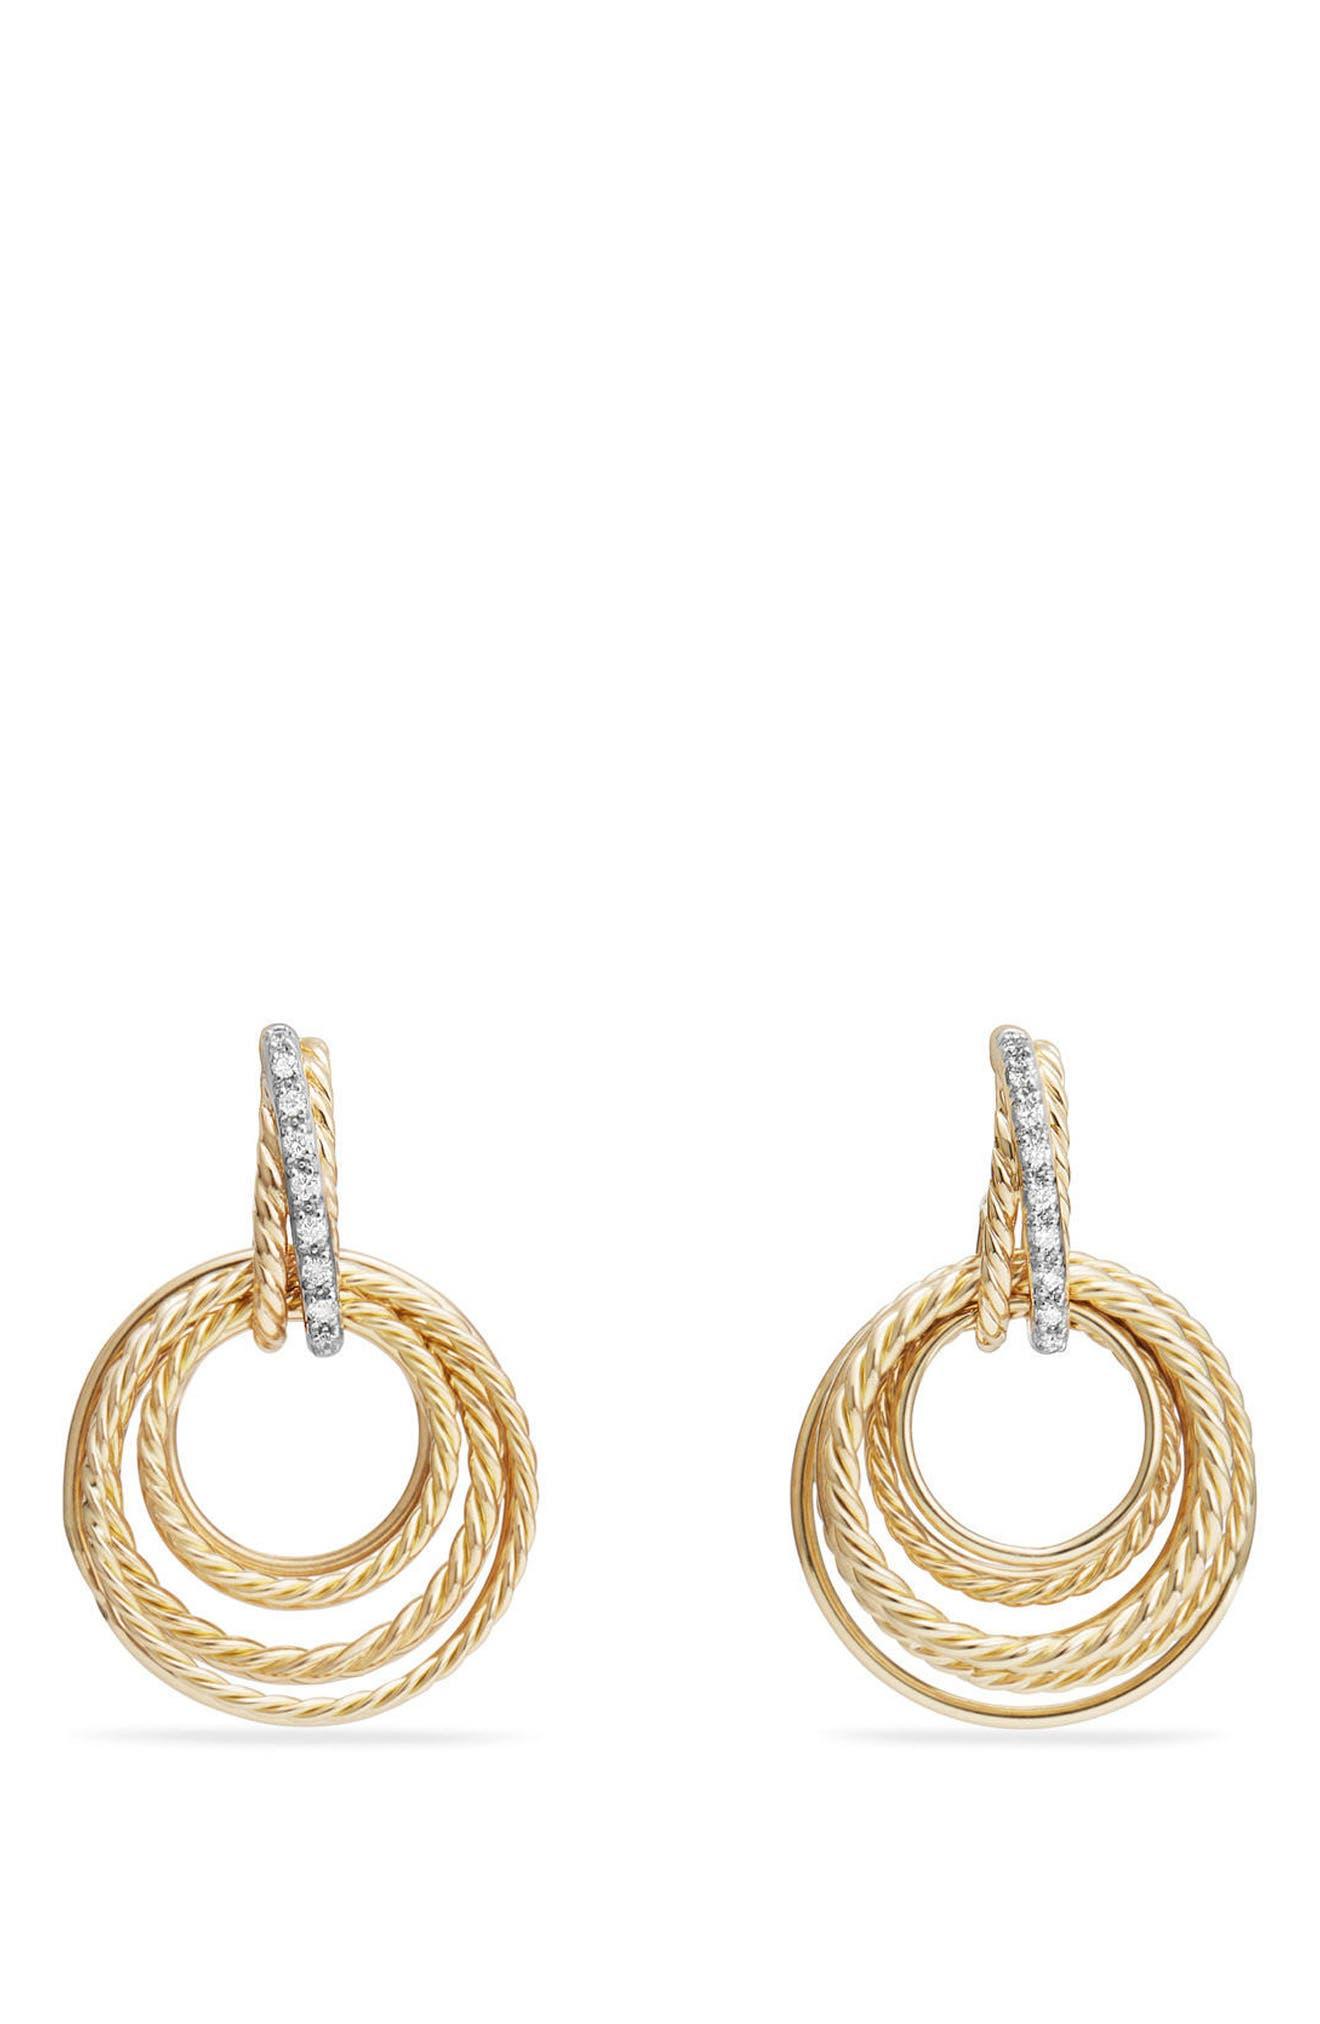 Crossover Diamond Drop Earrings,                         Main,                         color, YELLOW GOLD/ DIAMOND